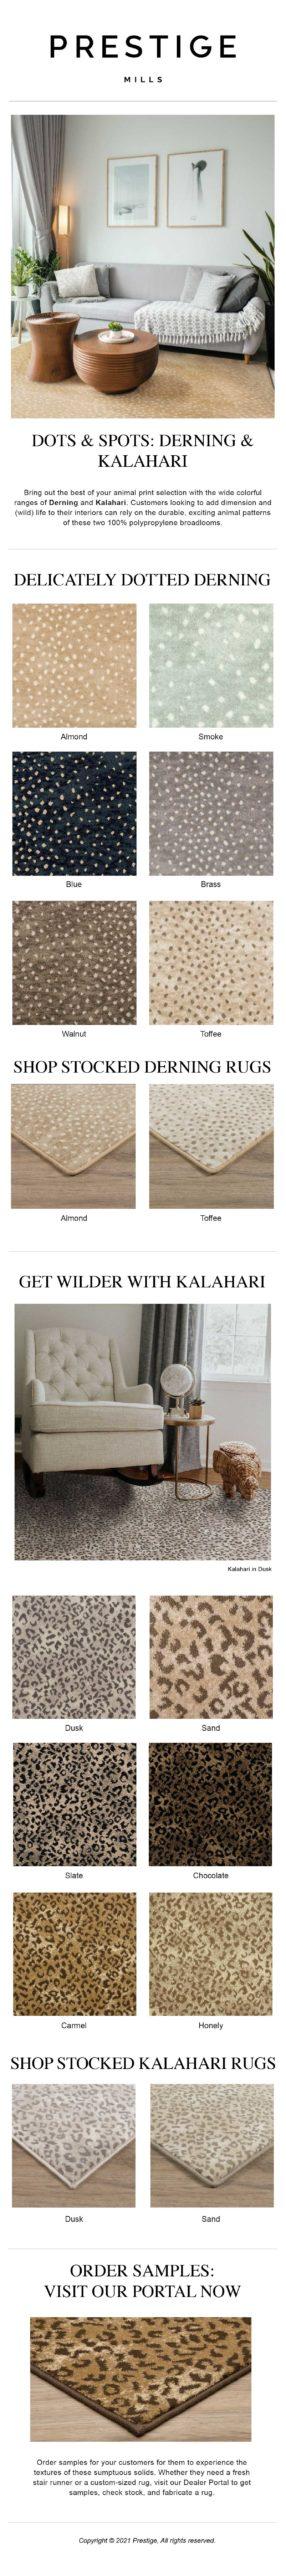 Spots & Dots: Derning & Kalahari Animal Prints